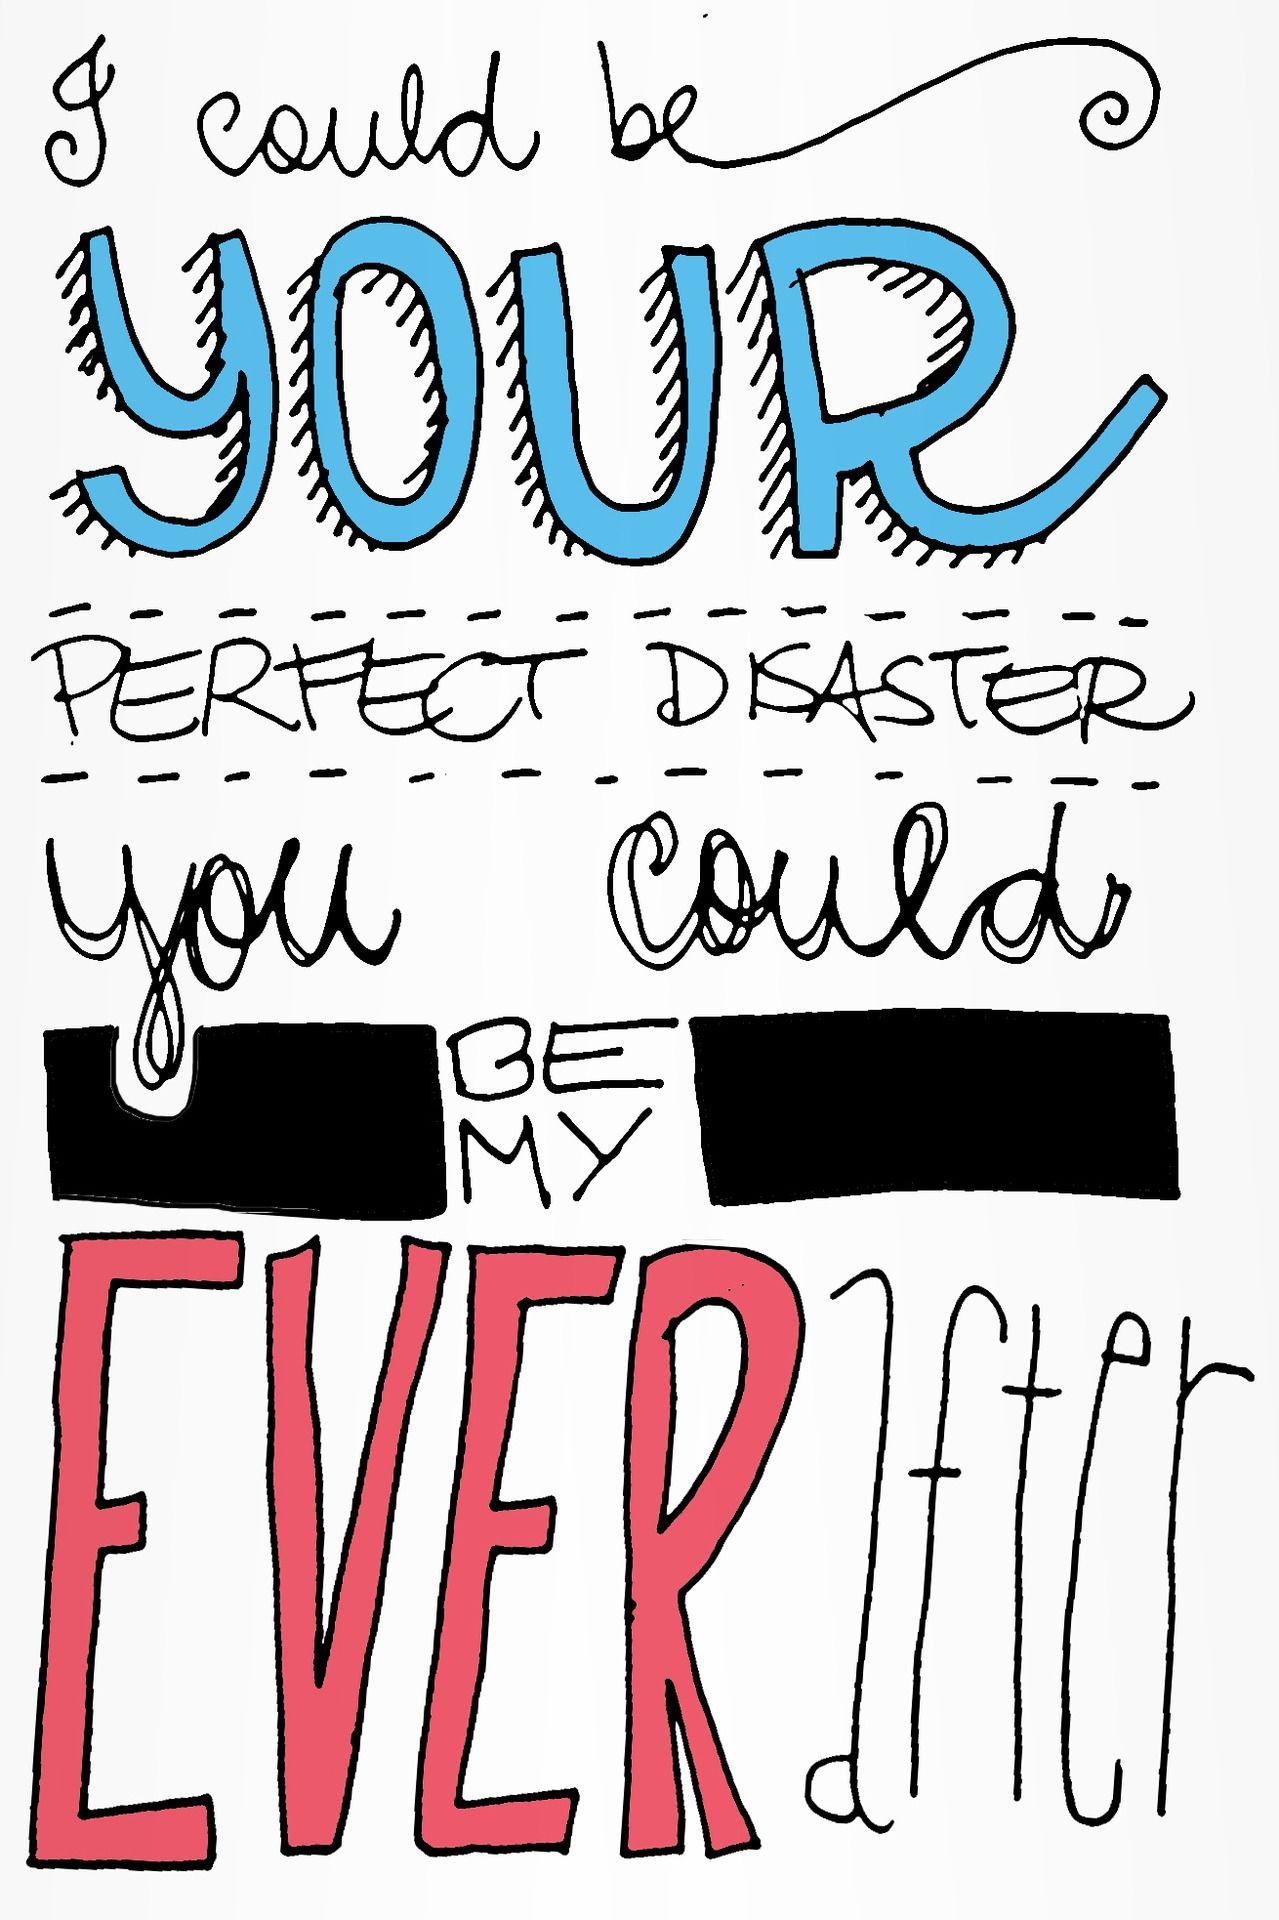 cute song lyric drawings tumblr love lyrics cute song lyrics. Black Bedroom Furniture Sets. Home Design Ideas